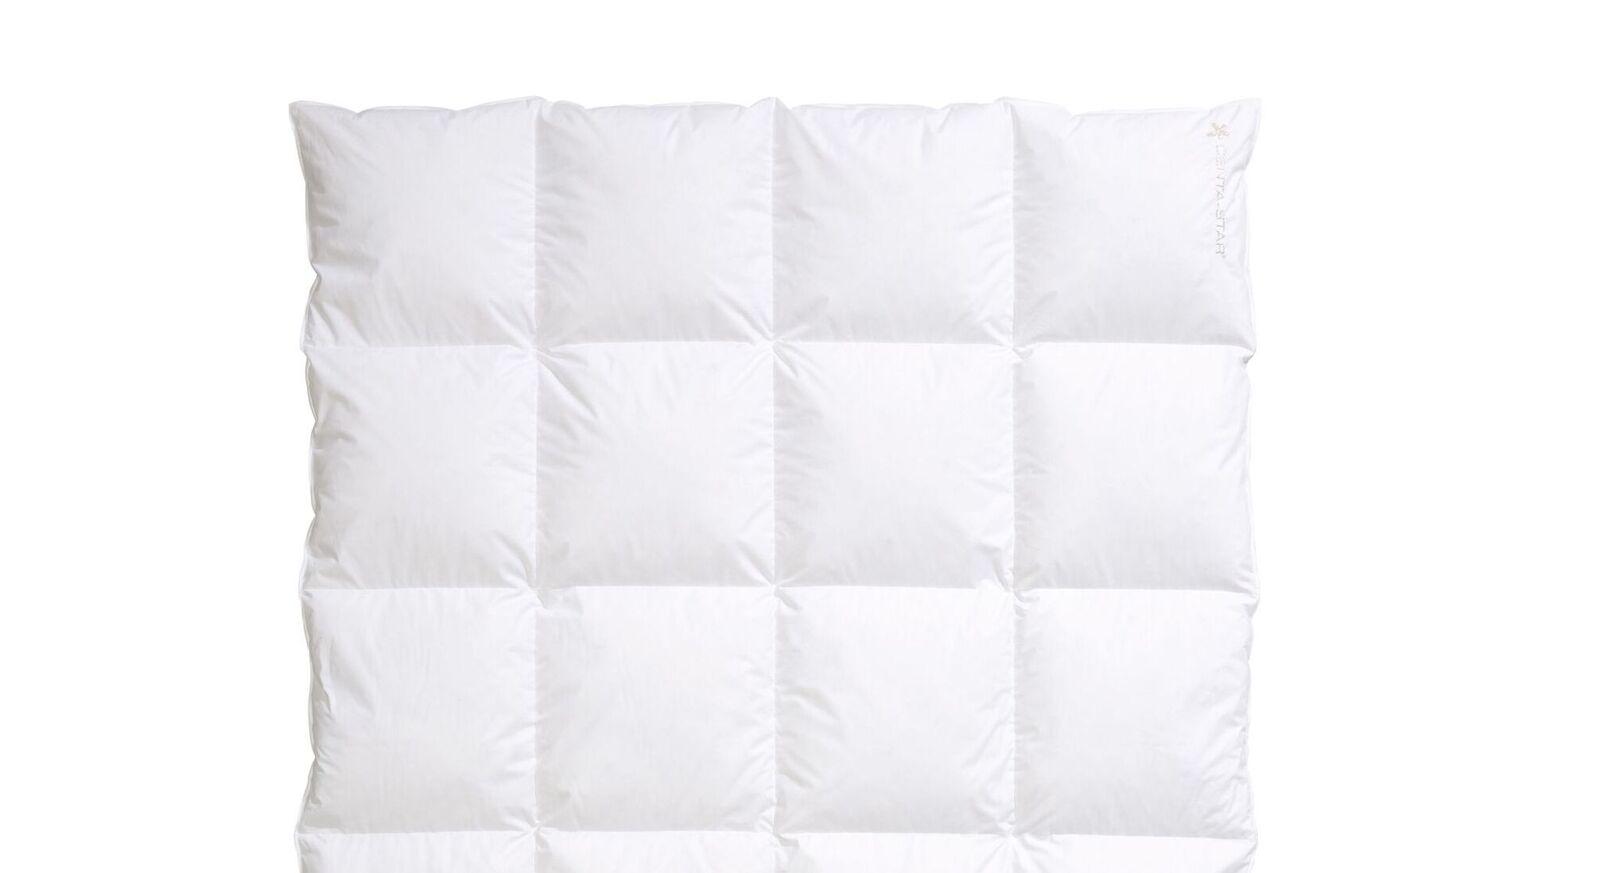 Daunen-Bettdecke Centa Star Moments warm mit Baumwoll-Bezug